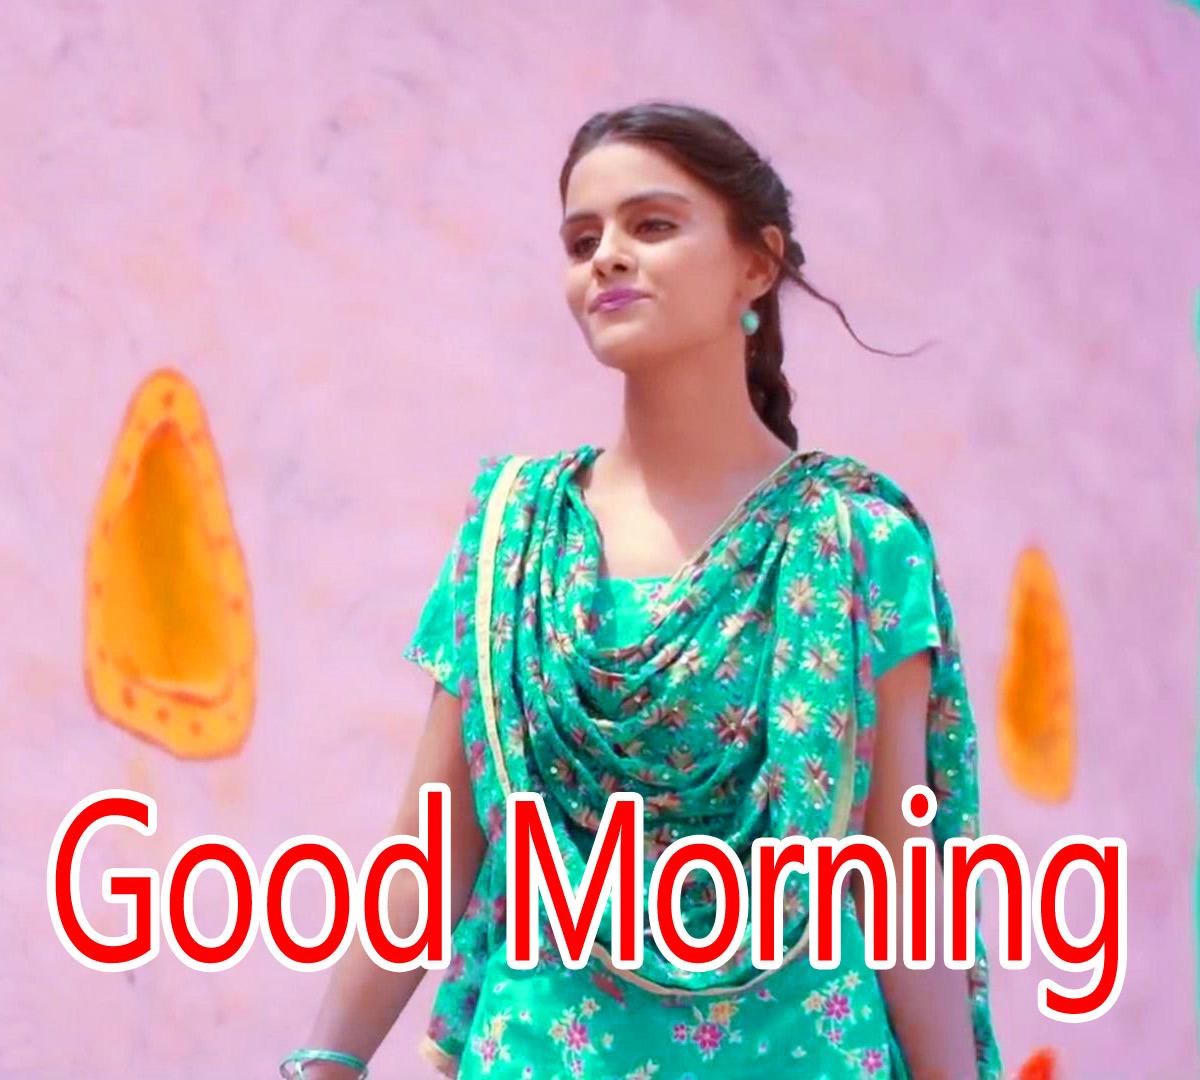 good morning Images for girls 5